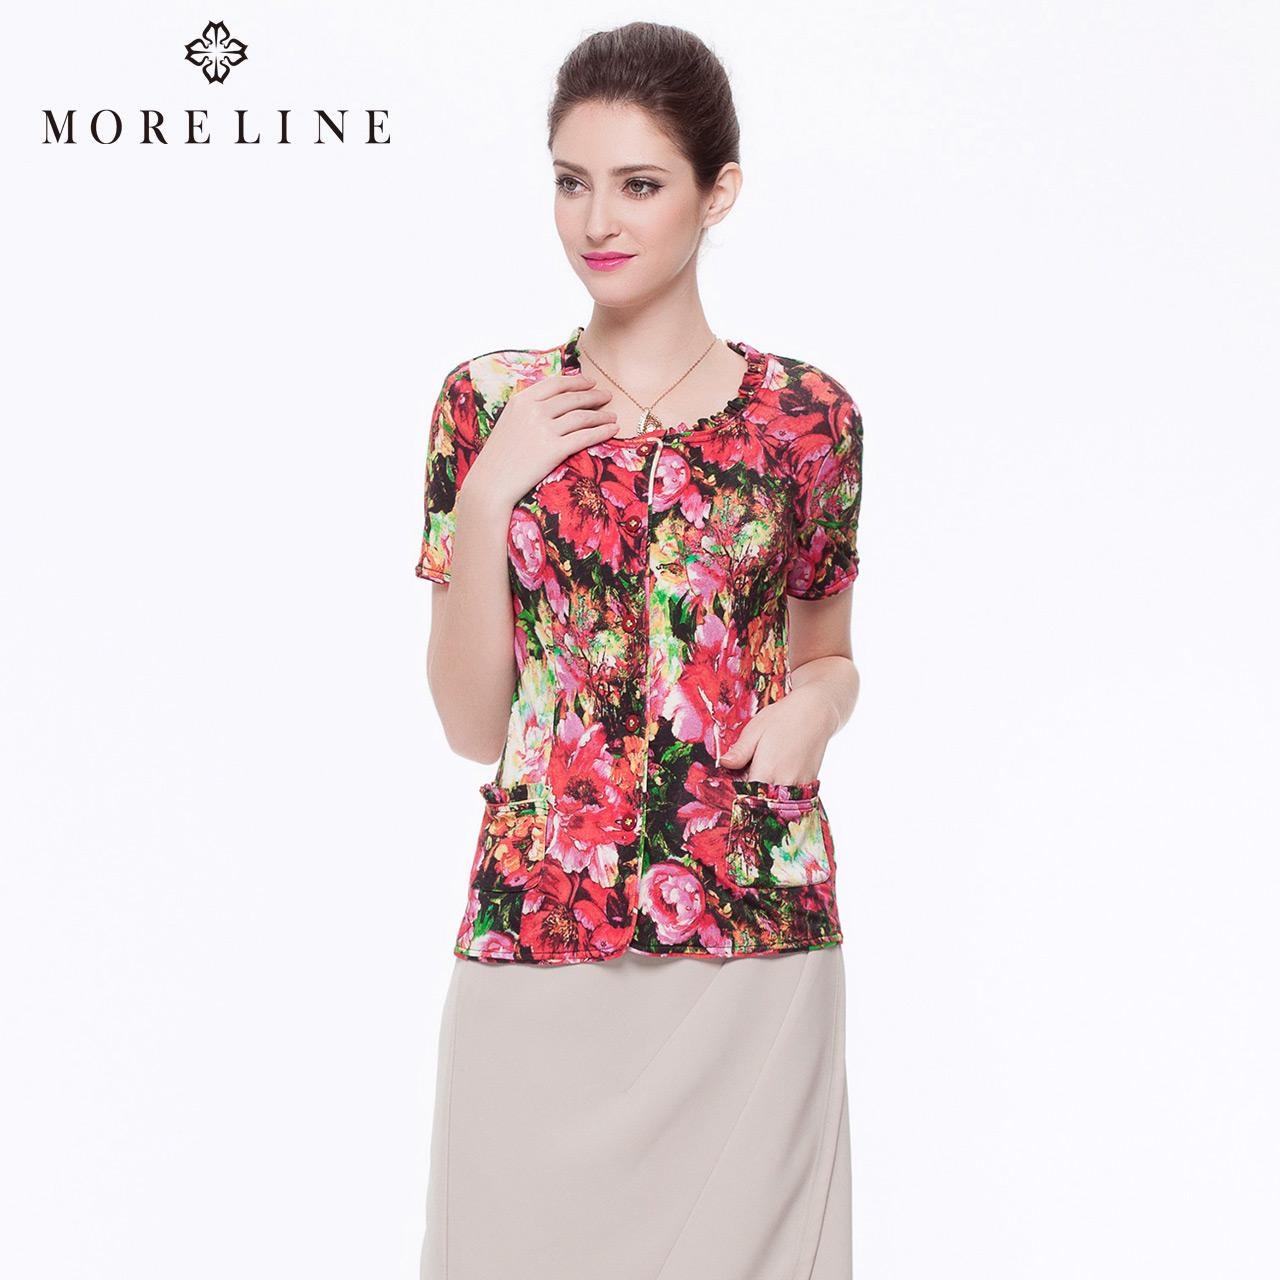 MORELINE沐兰夏装精品浪漫印花短款修身短袖衬衫女上衣7249932